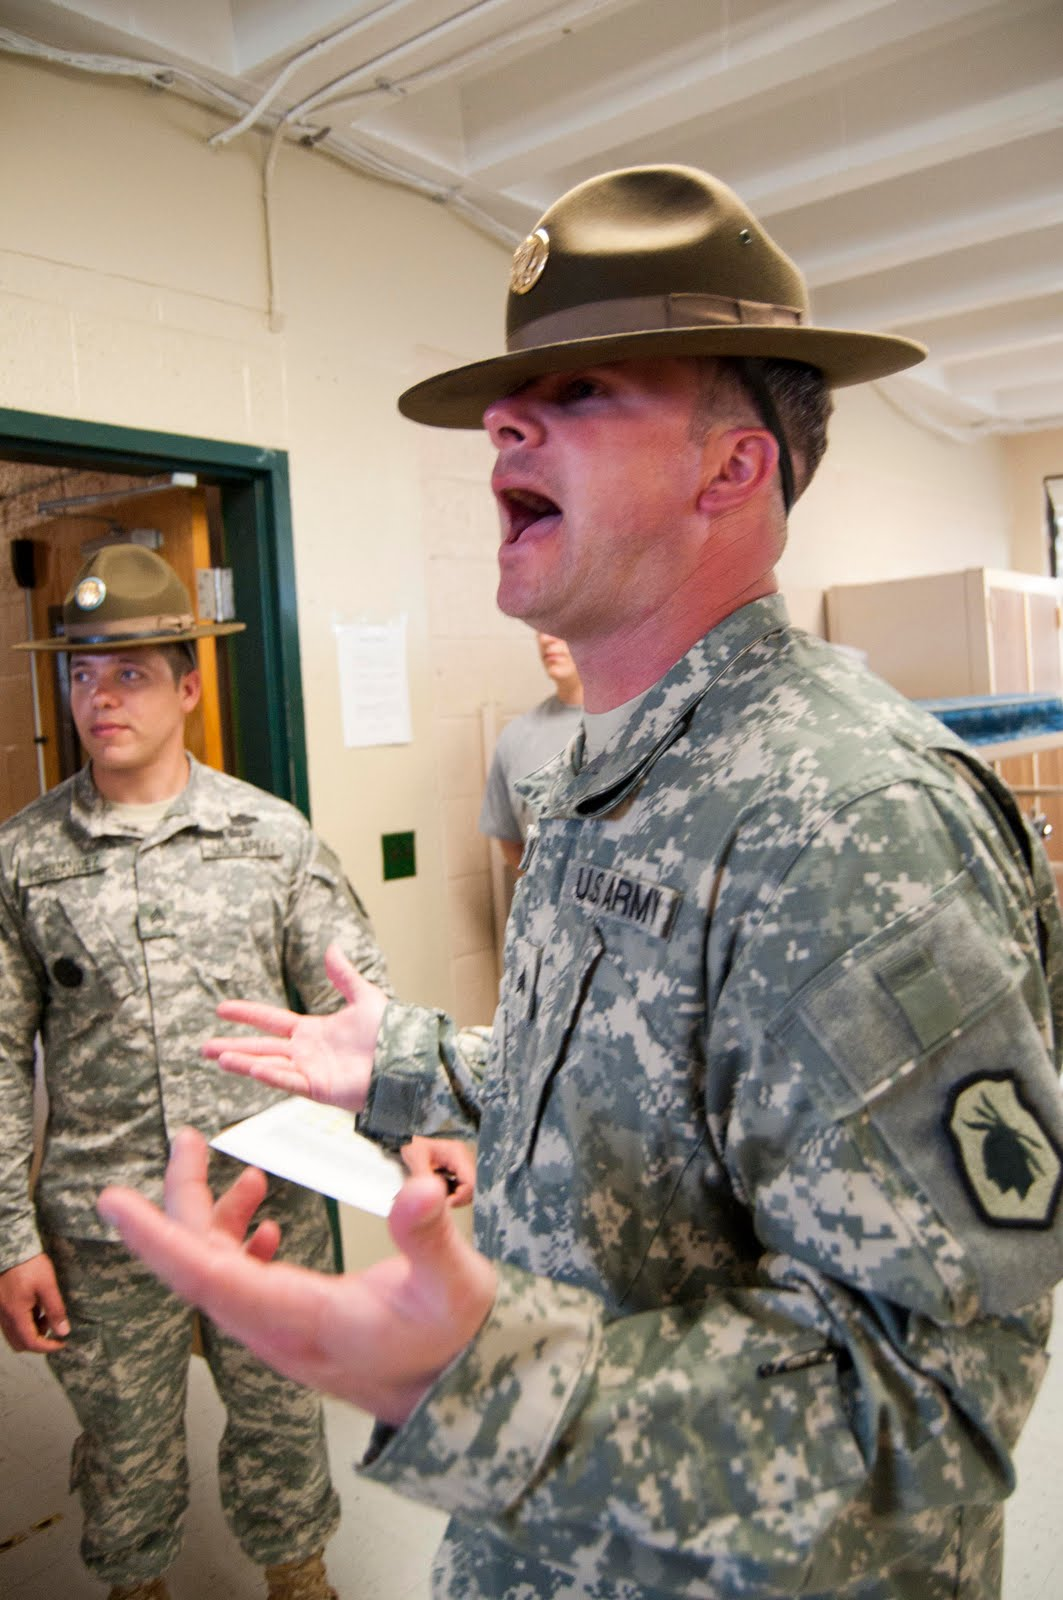 Shutterspeed: Yes, Drill Sergeant!